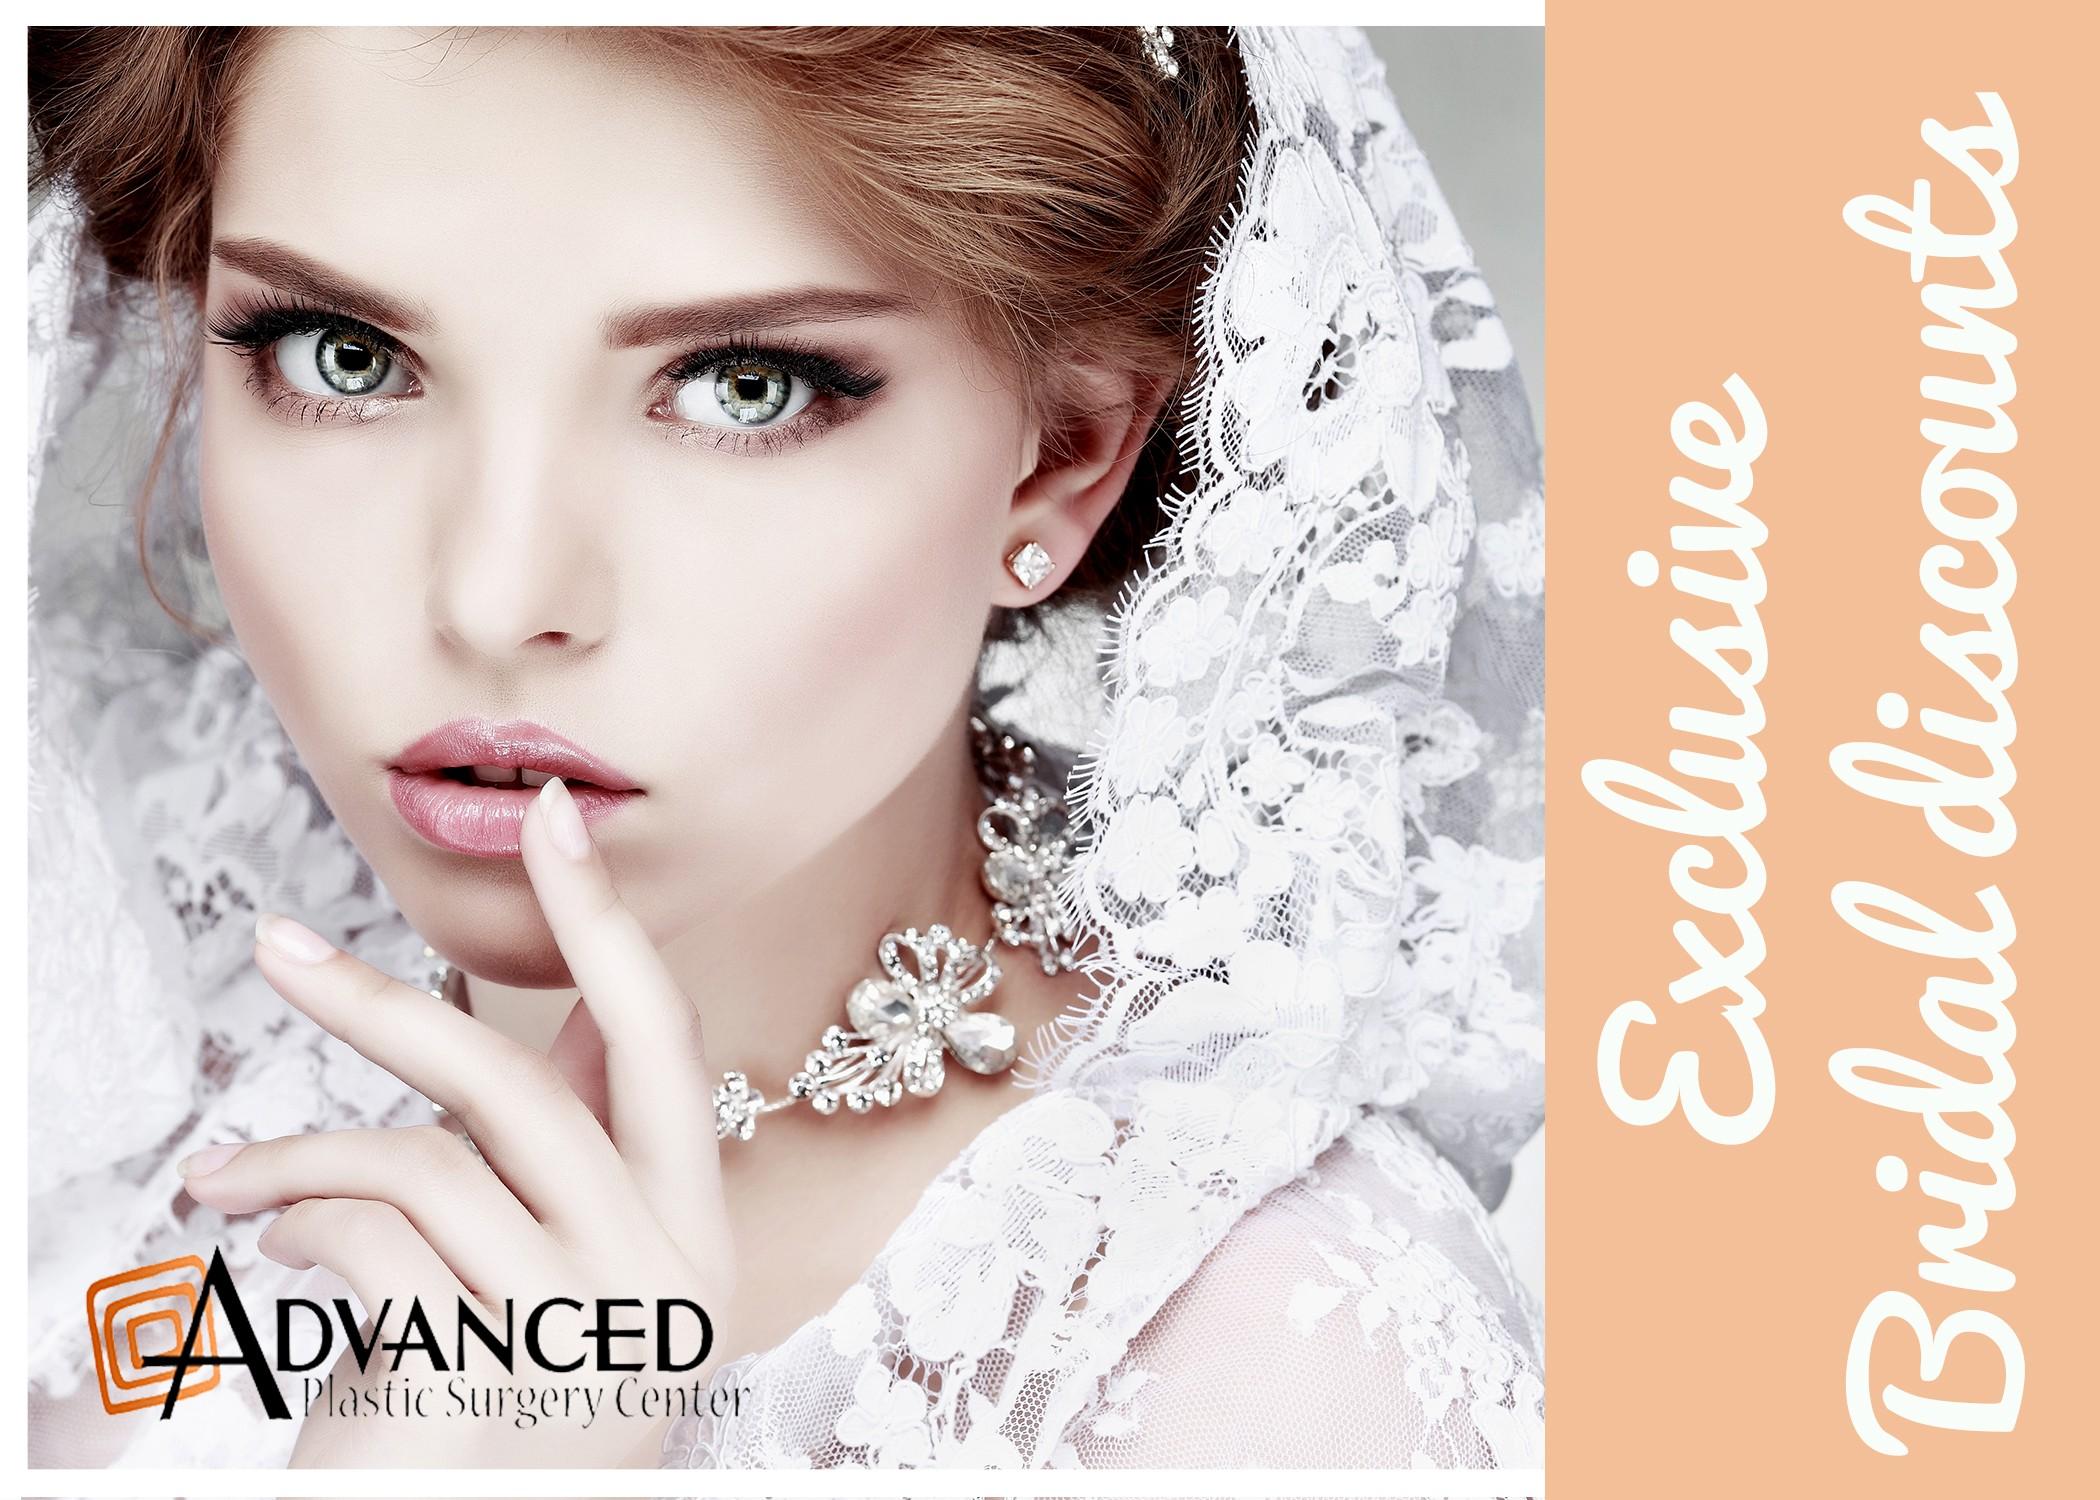 Bridal Expo Handout